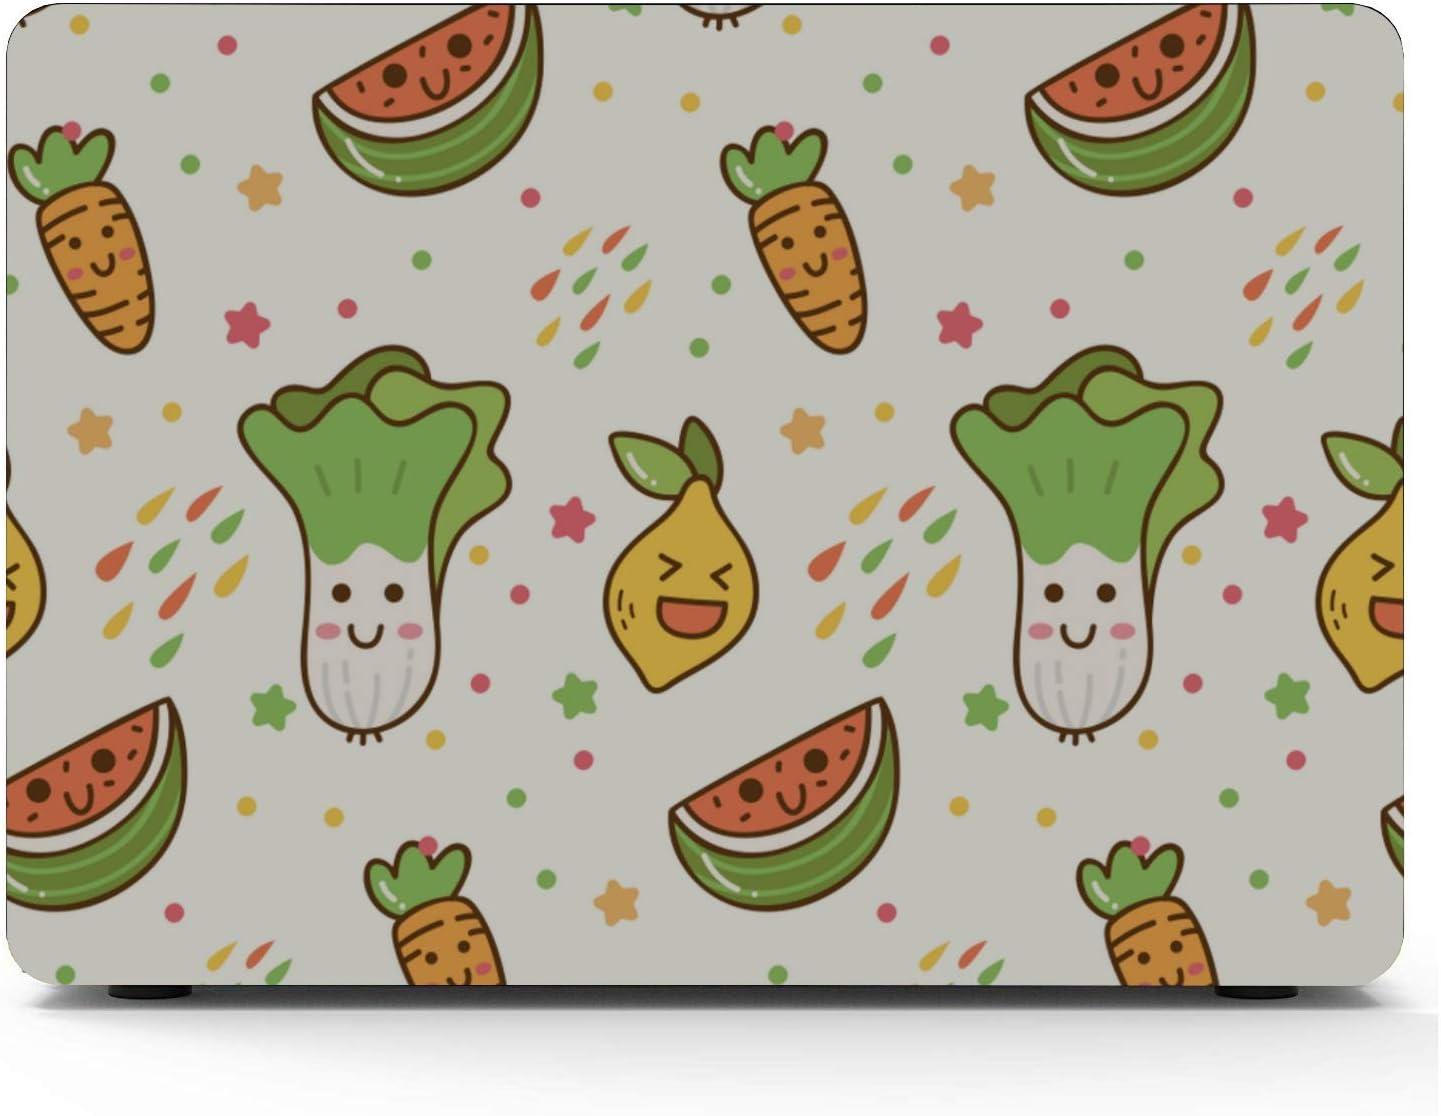 Cover for MacBook Air Summer Sour Retro Cute Fruit Lemon Plastic Hard Shell Compatible Mac Air 11 Pro 13 15 2018 MacBook Air Case Protection for MacBook 2016-2019 Version